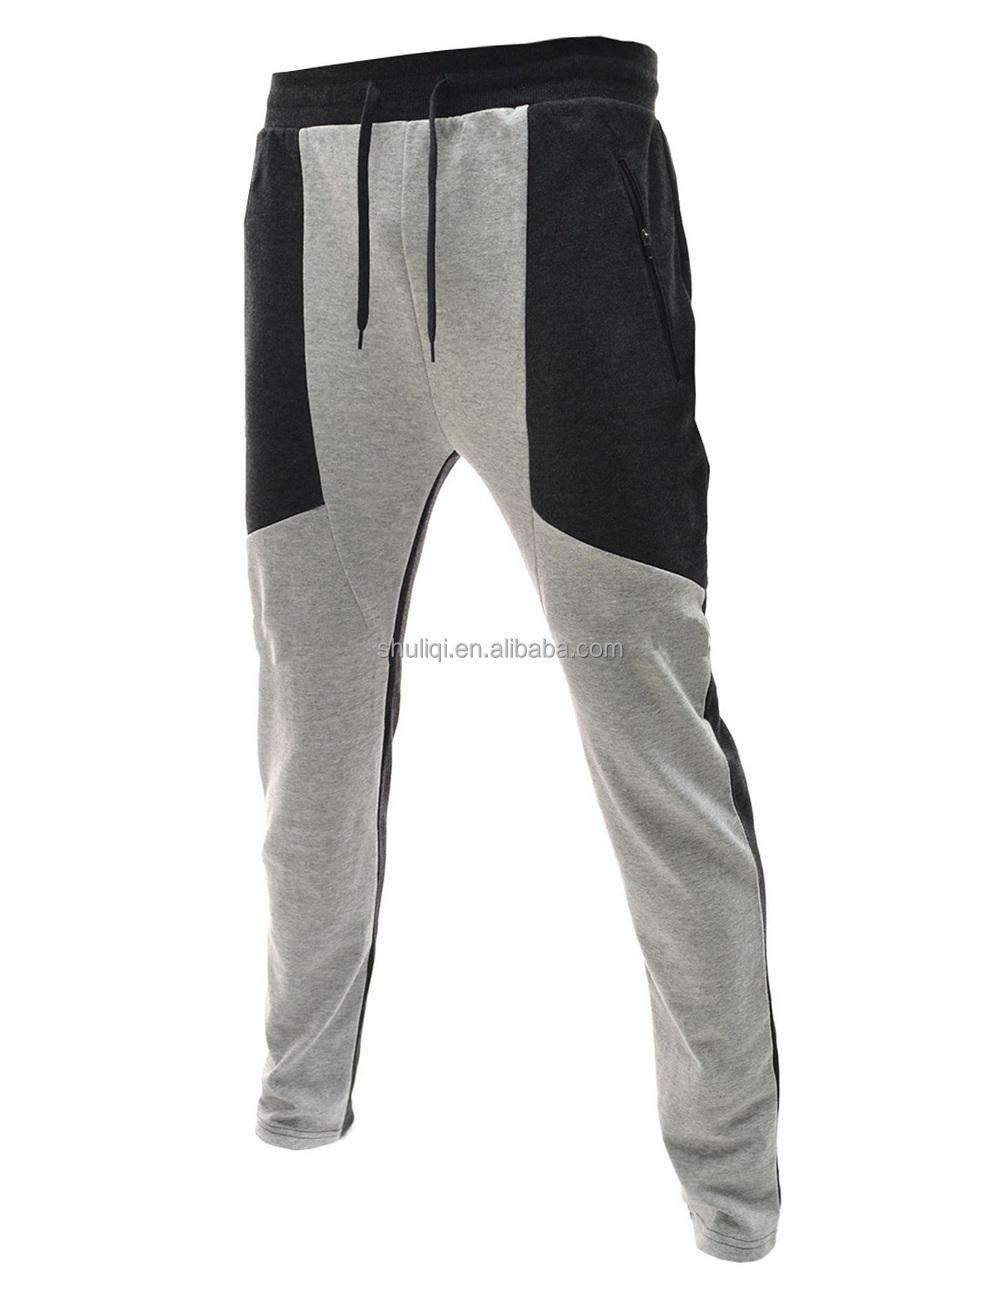 black sweatpants blank - photo #8